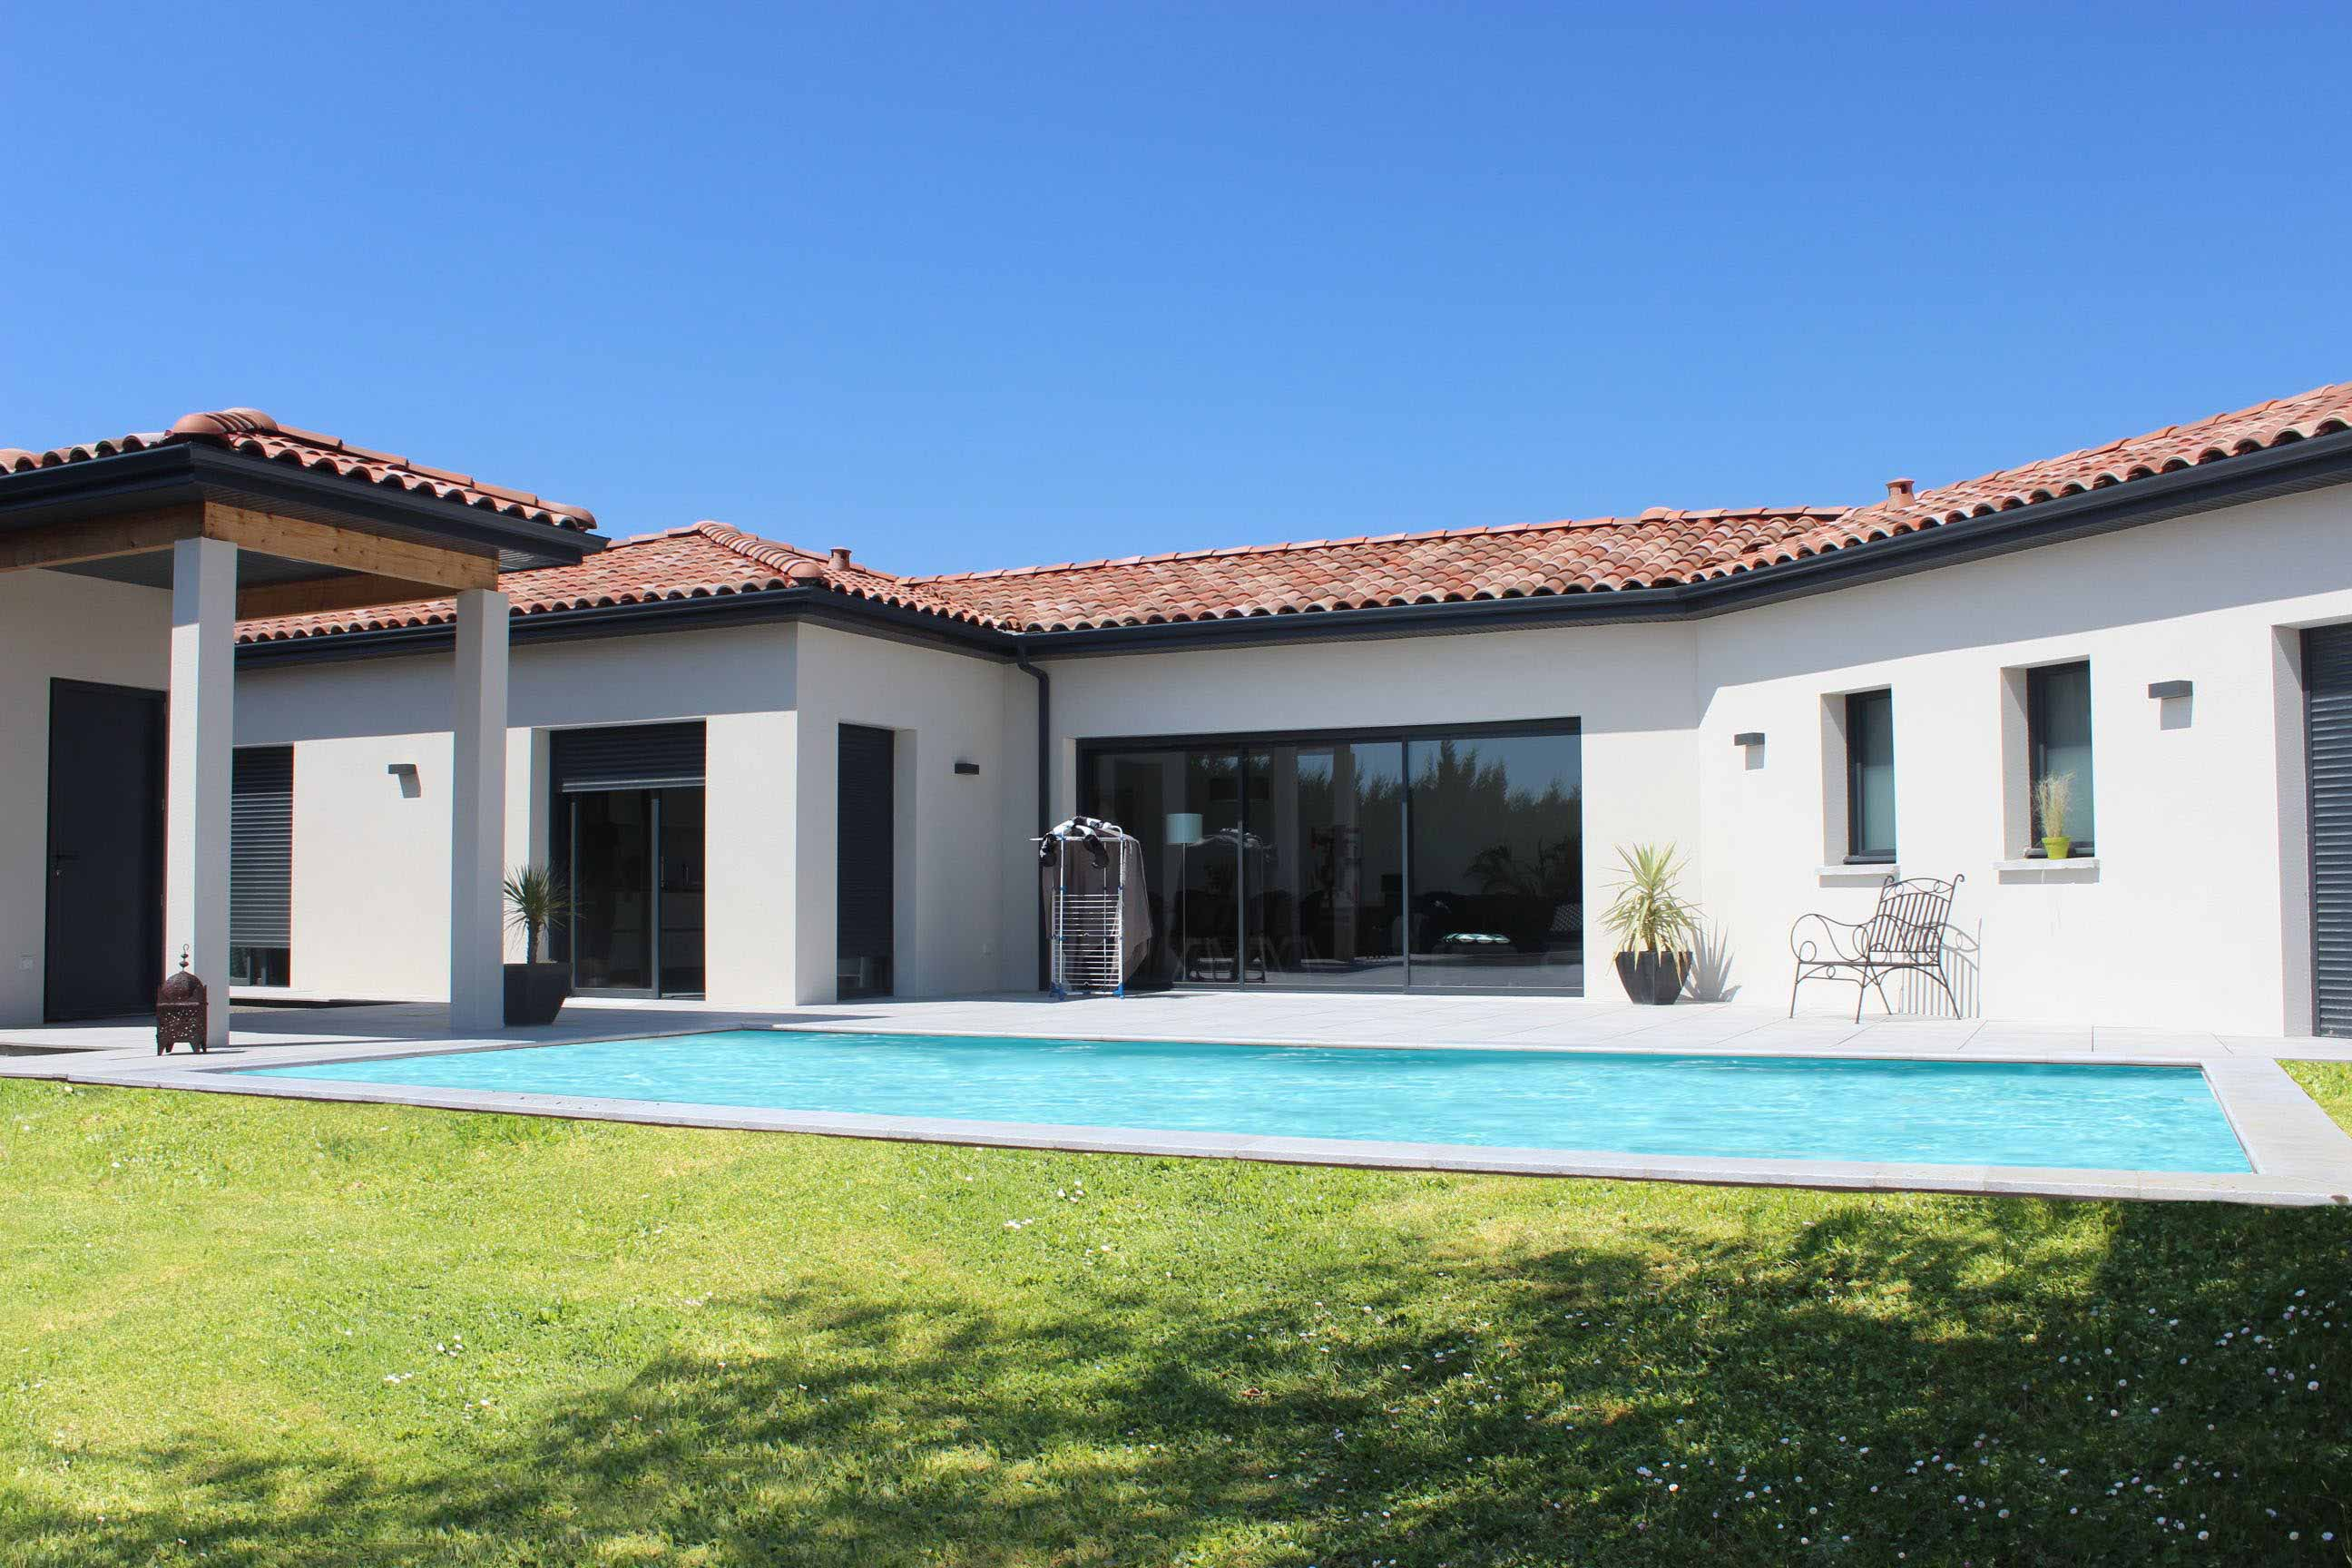 maison moderne plain pied 06 piscine. Black Bedroom Furniture Sets. Home Design Ideas